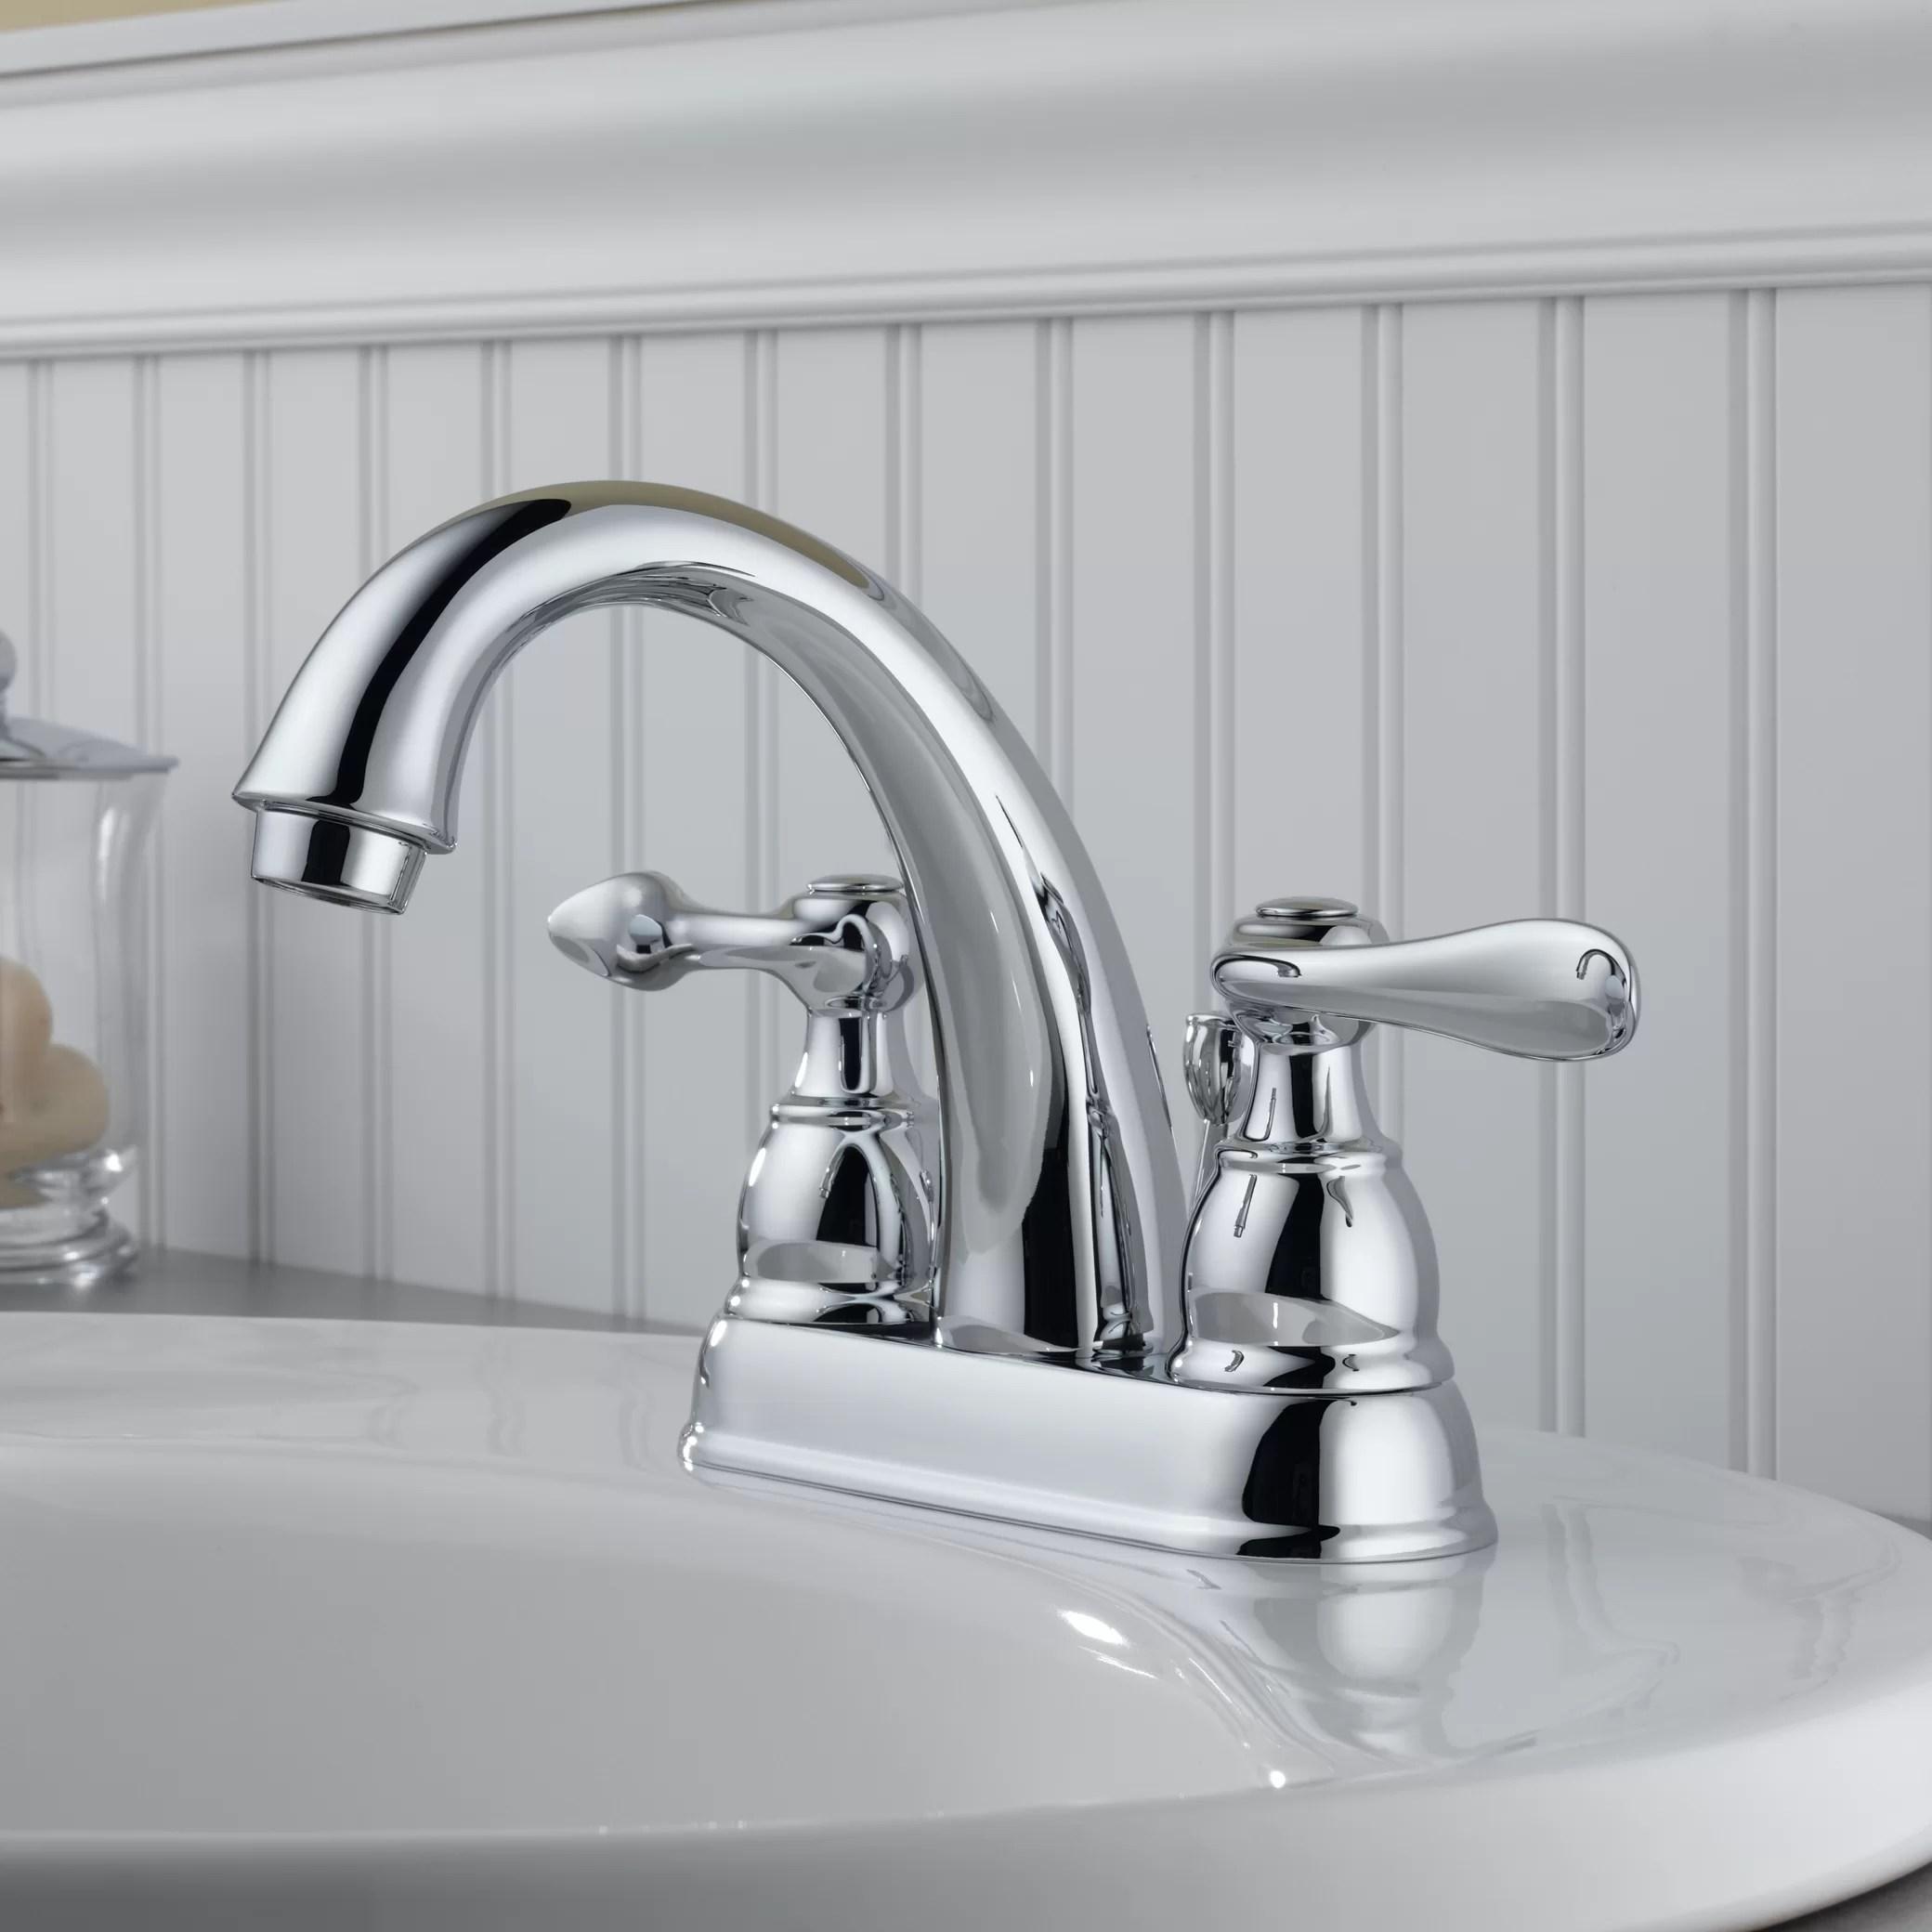 Delta Windemere Centerset Bathroom Faucet with Metal Pop